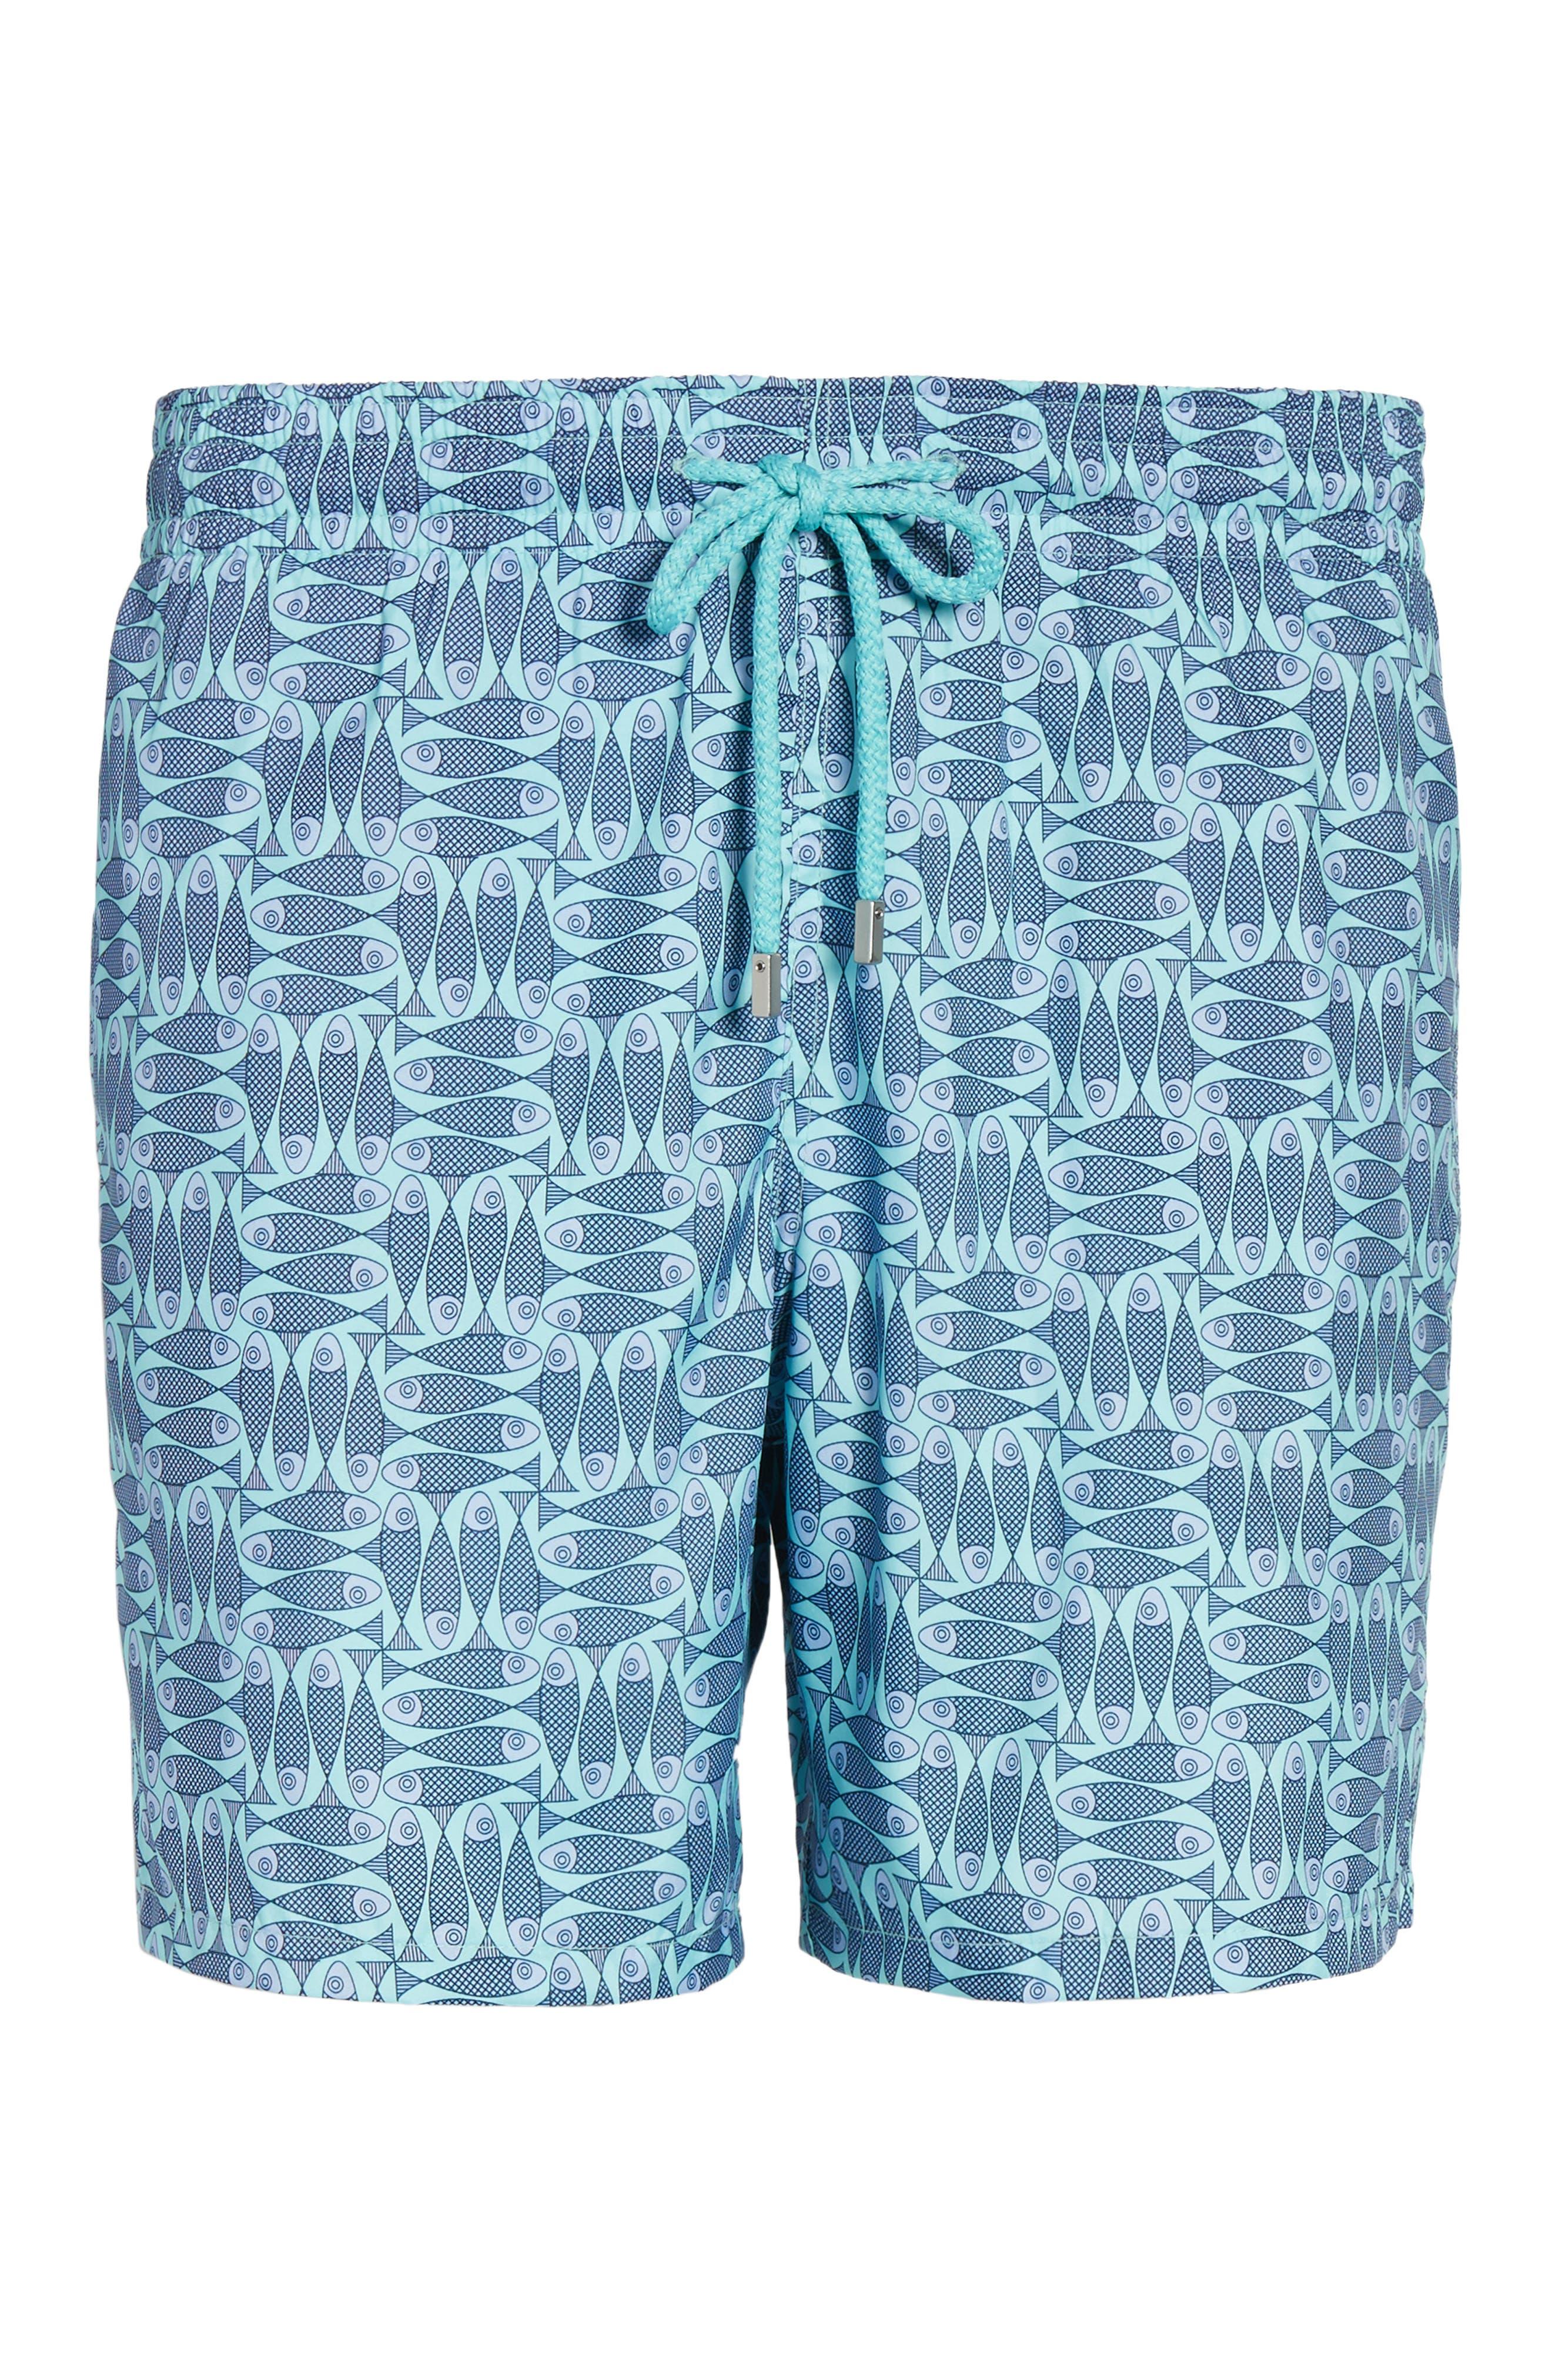 Mahina Packable Swim Trunks,                             Alternate thumbnail 6, color,